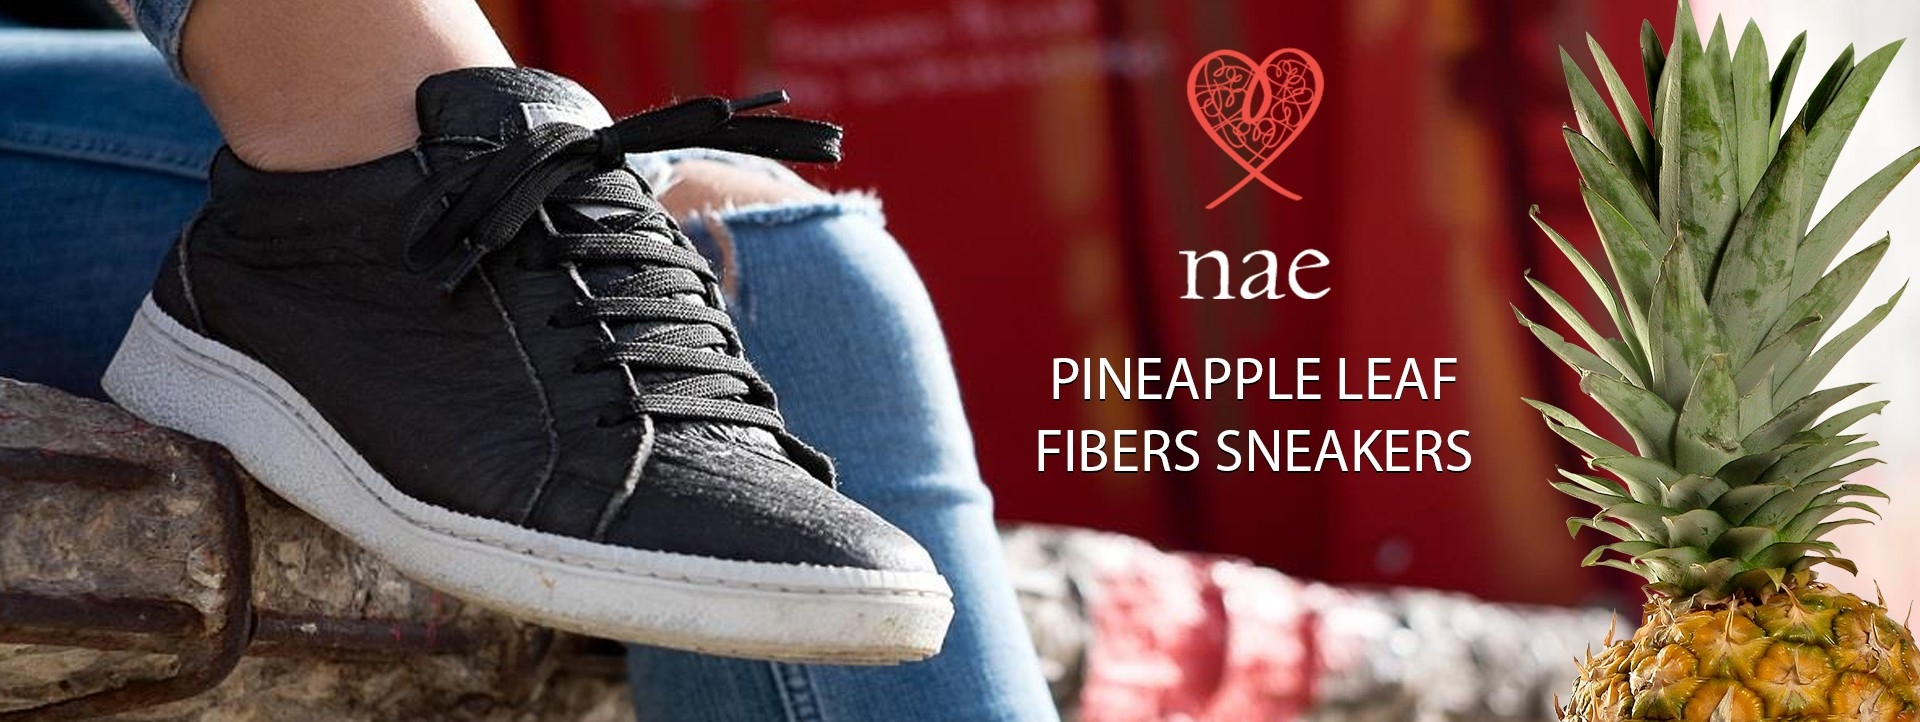 Nae - VeganShoes.it